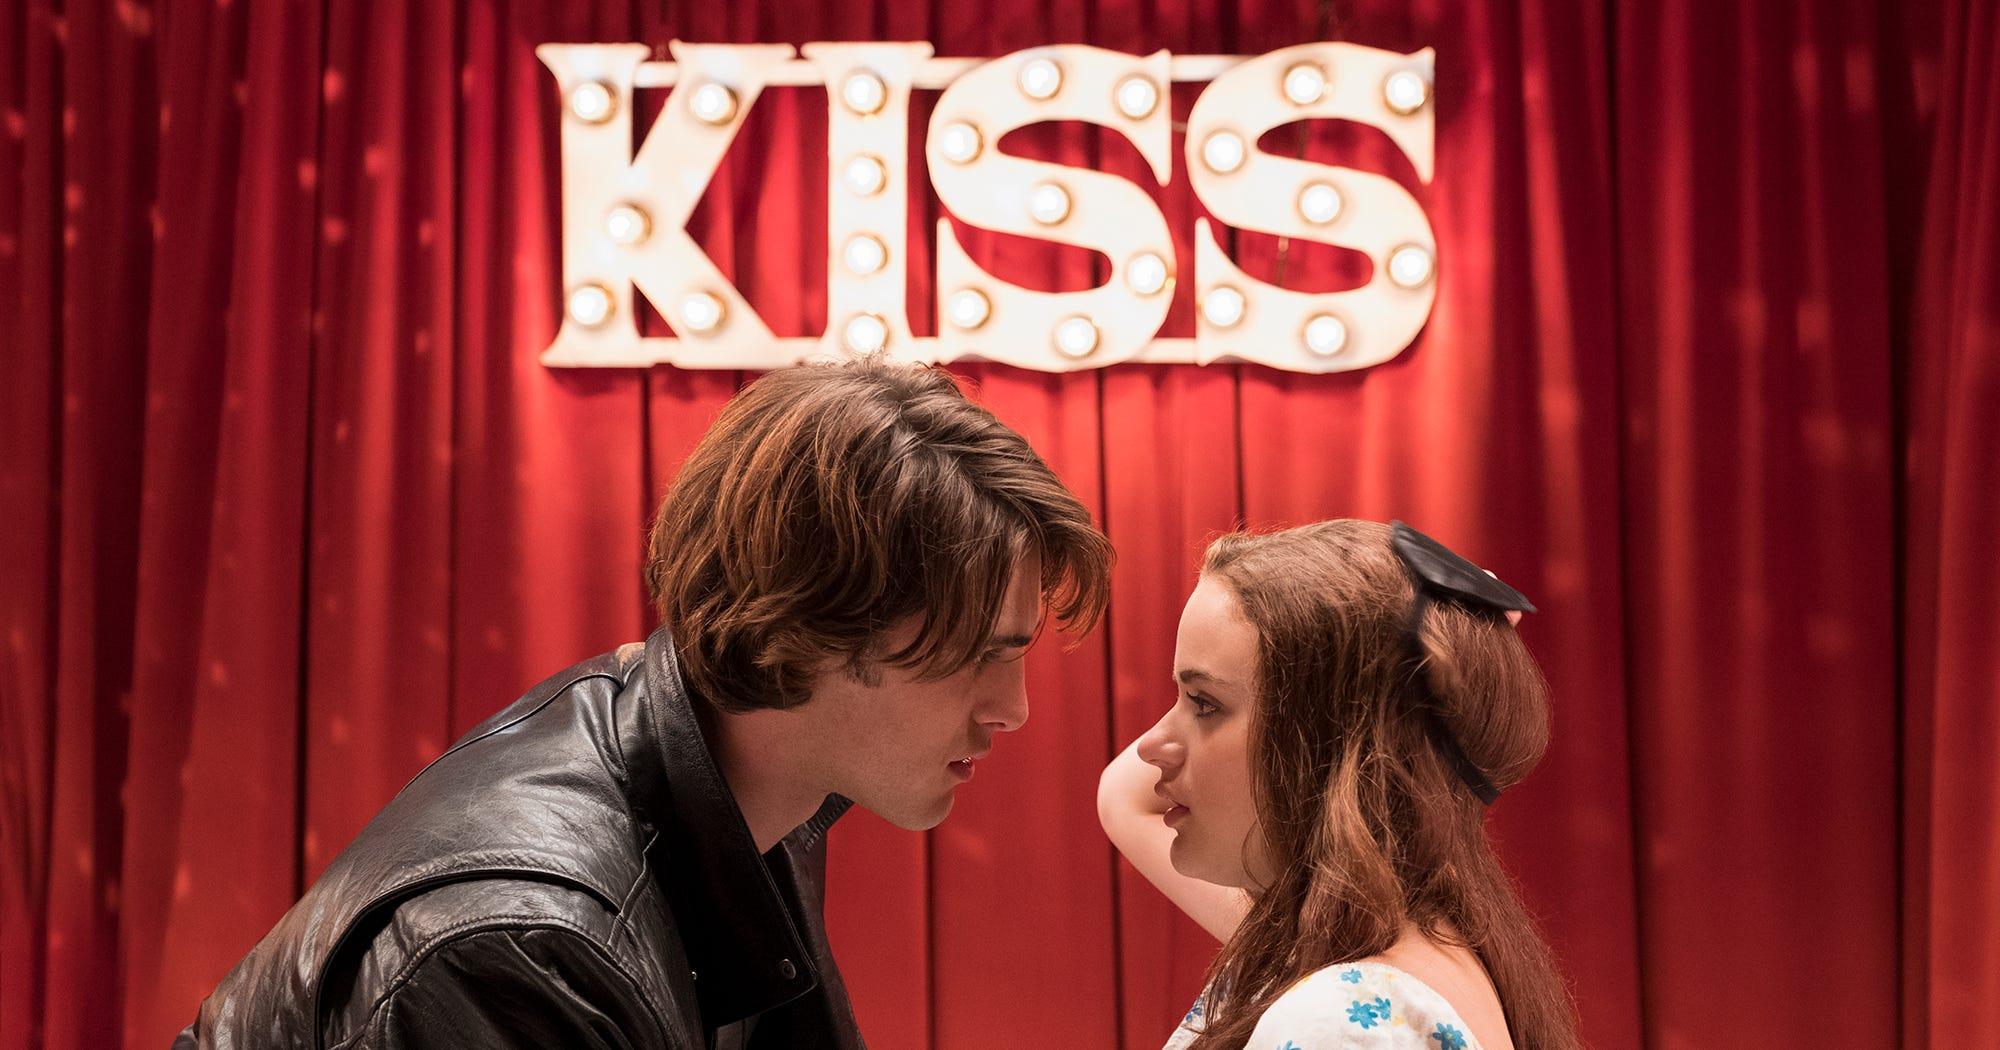 Jacob Elordi Noah Has New Girlfriend In Kissing Booth 2